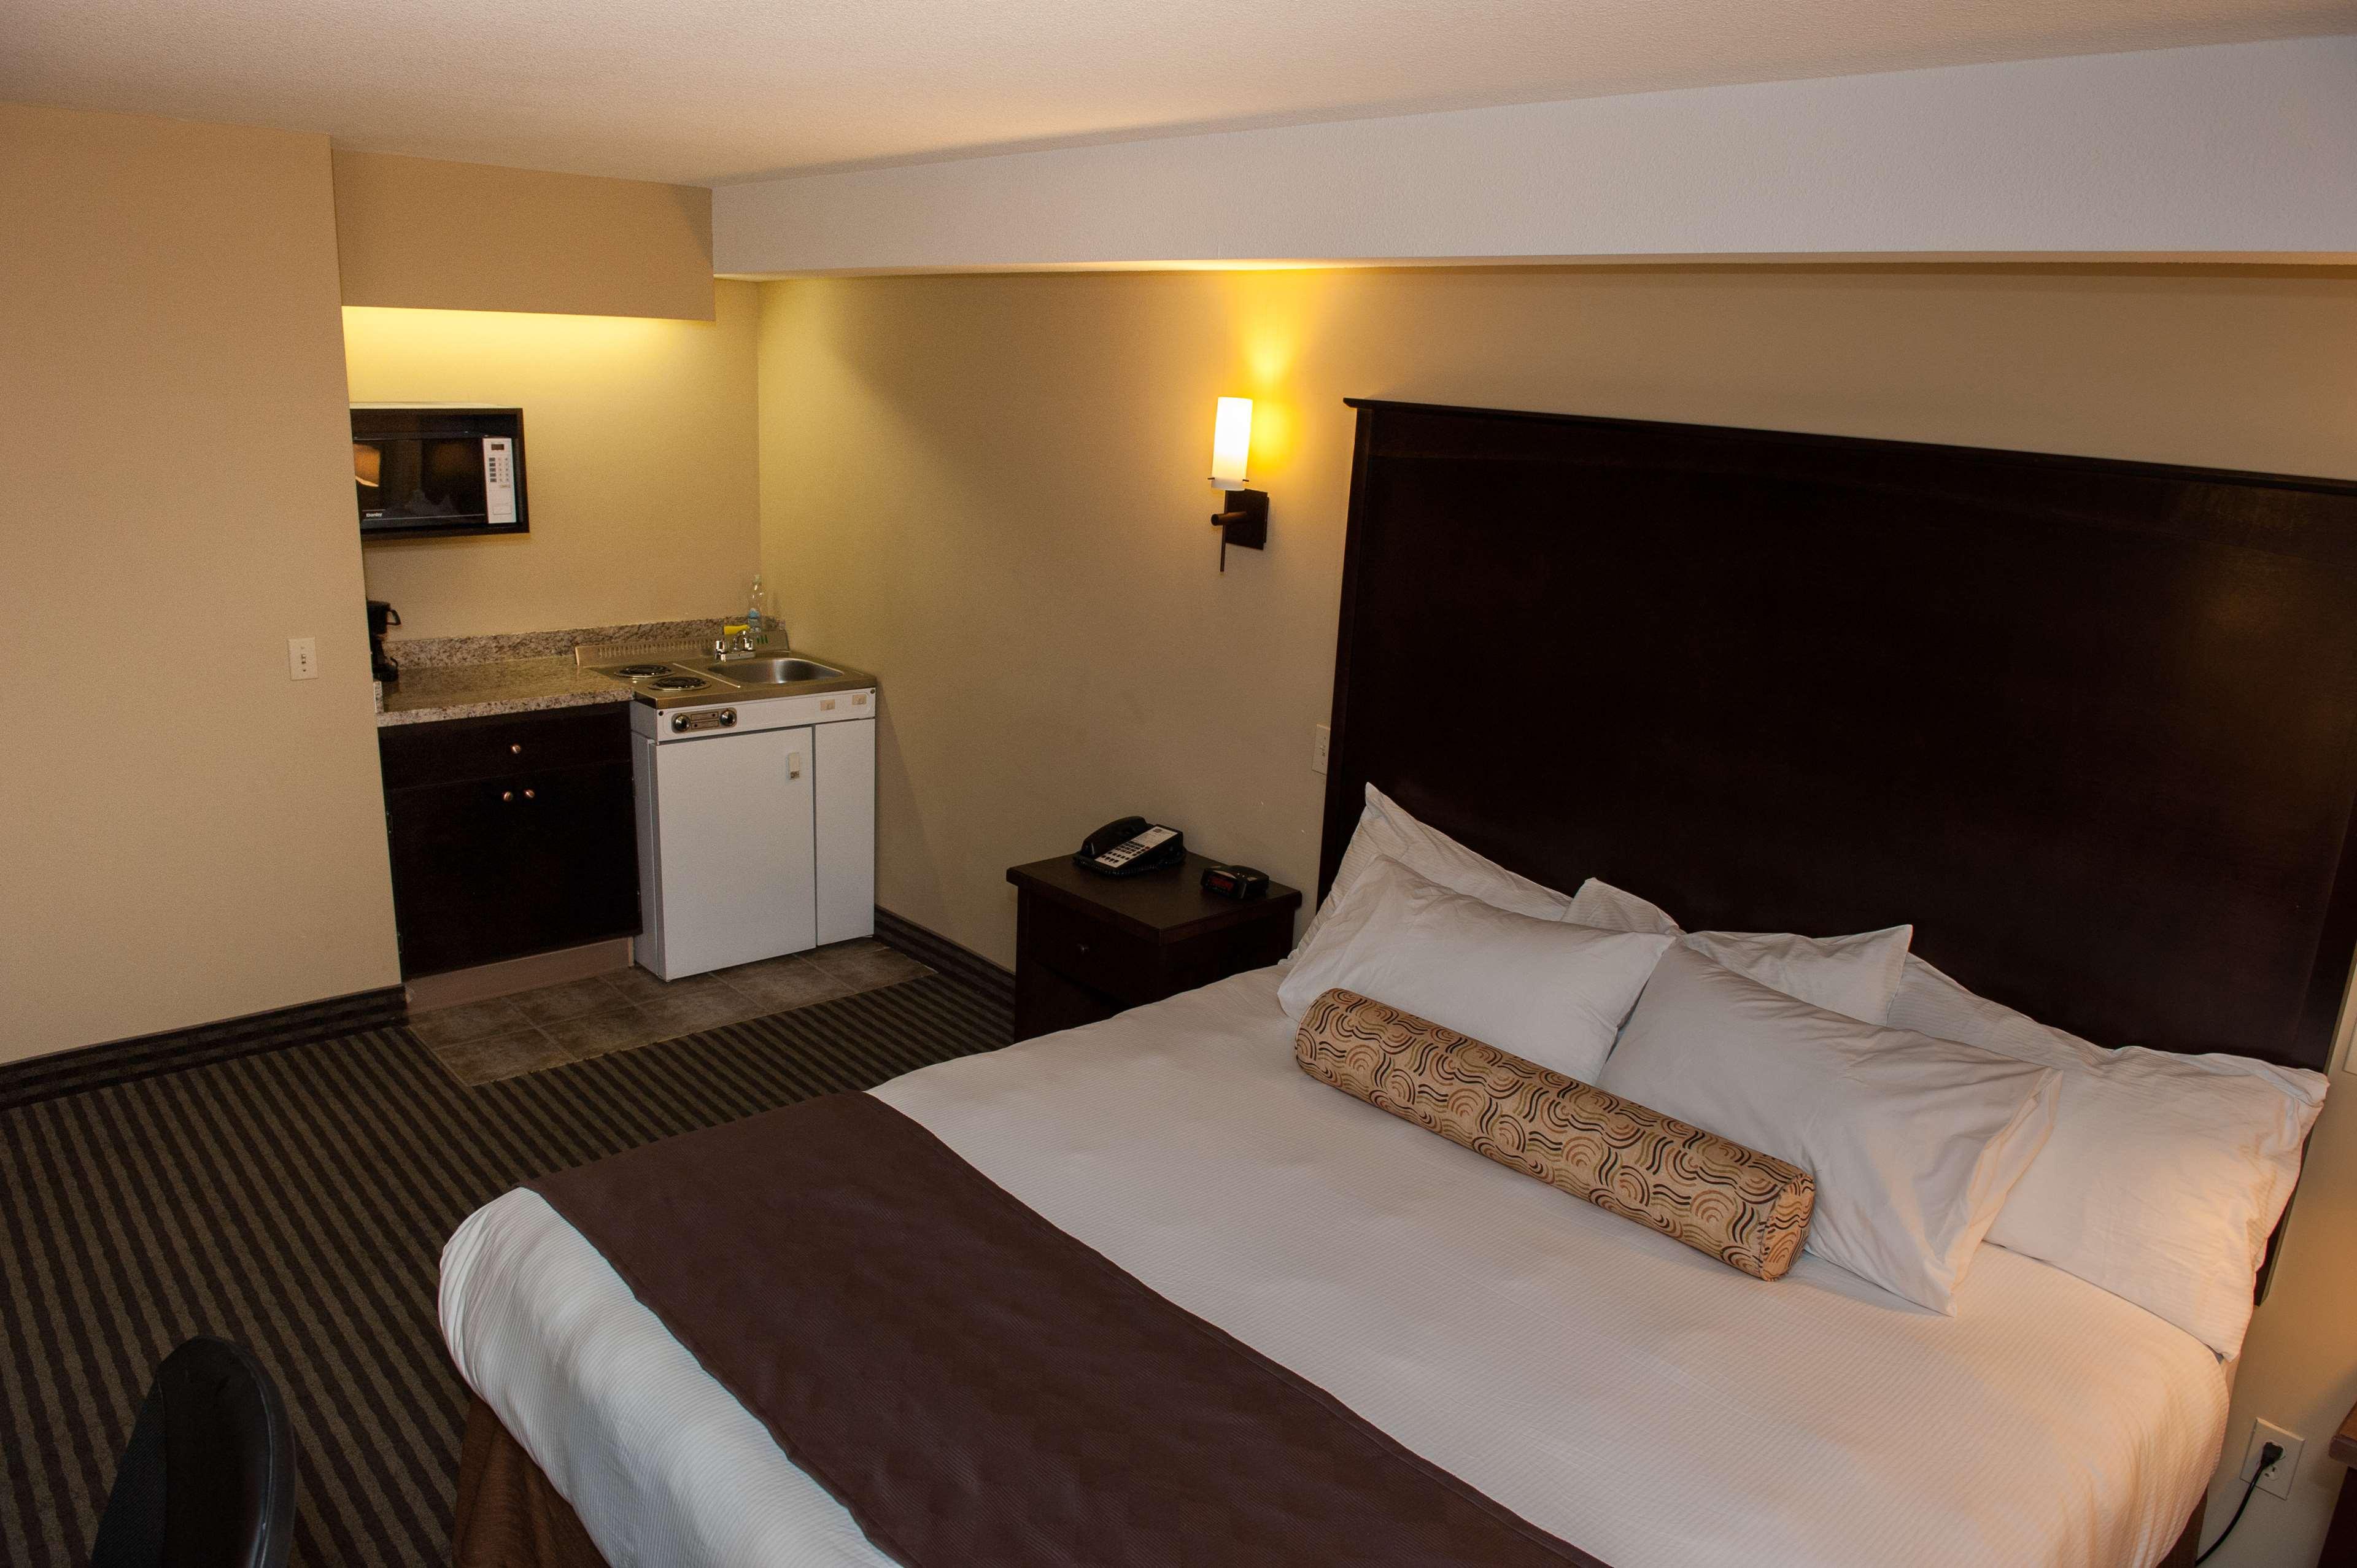 Best Western Maple Ridge Hotel in Maple Ridge: King Guest Room with Kitchen